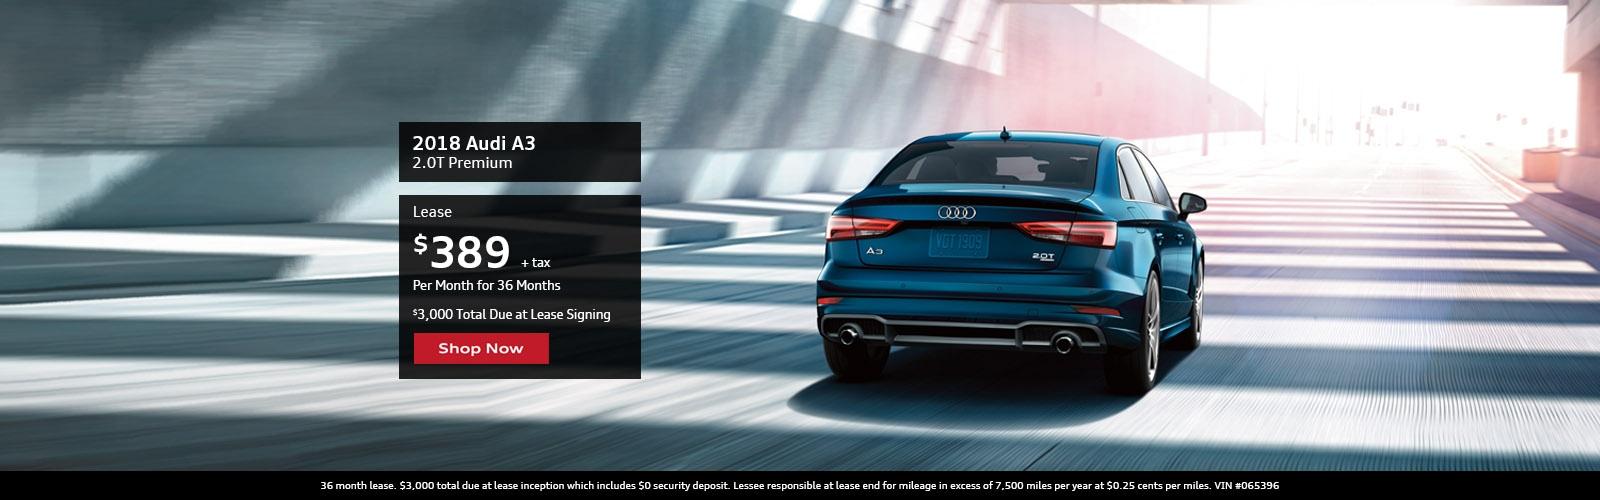 Audi Livermore New Audi Dealership In Livermore CA - Audi lease specials